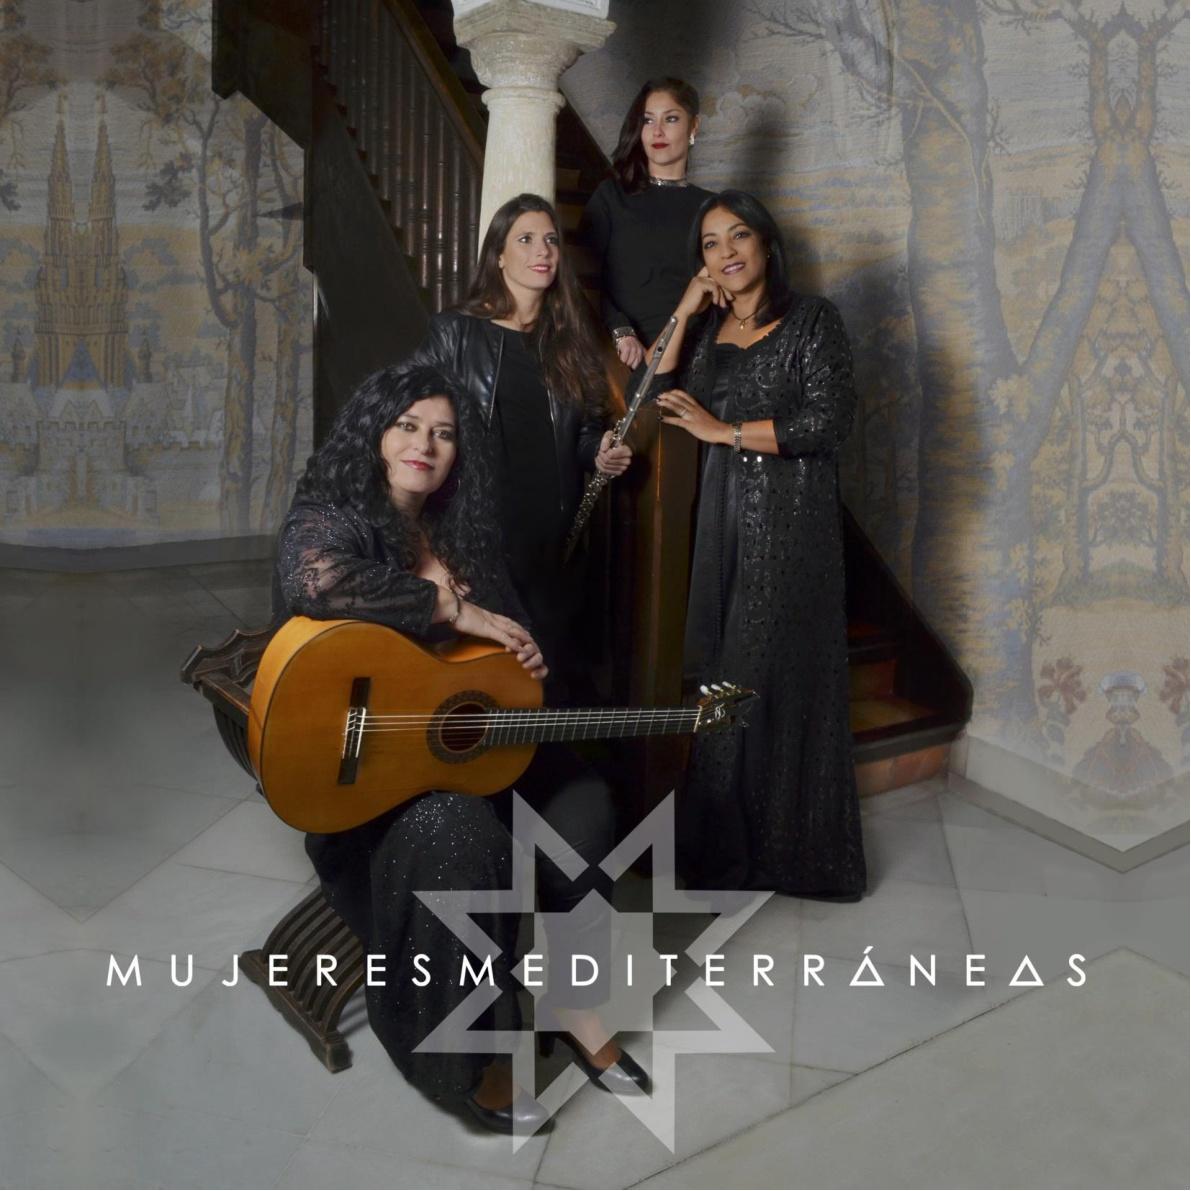 http://www.toledo.es/wp-content/uploads/2018/08/mujeres-mediterraneas.jpg. MUJERES MEDITERRANEAS